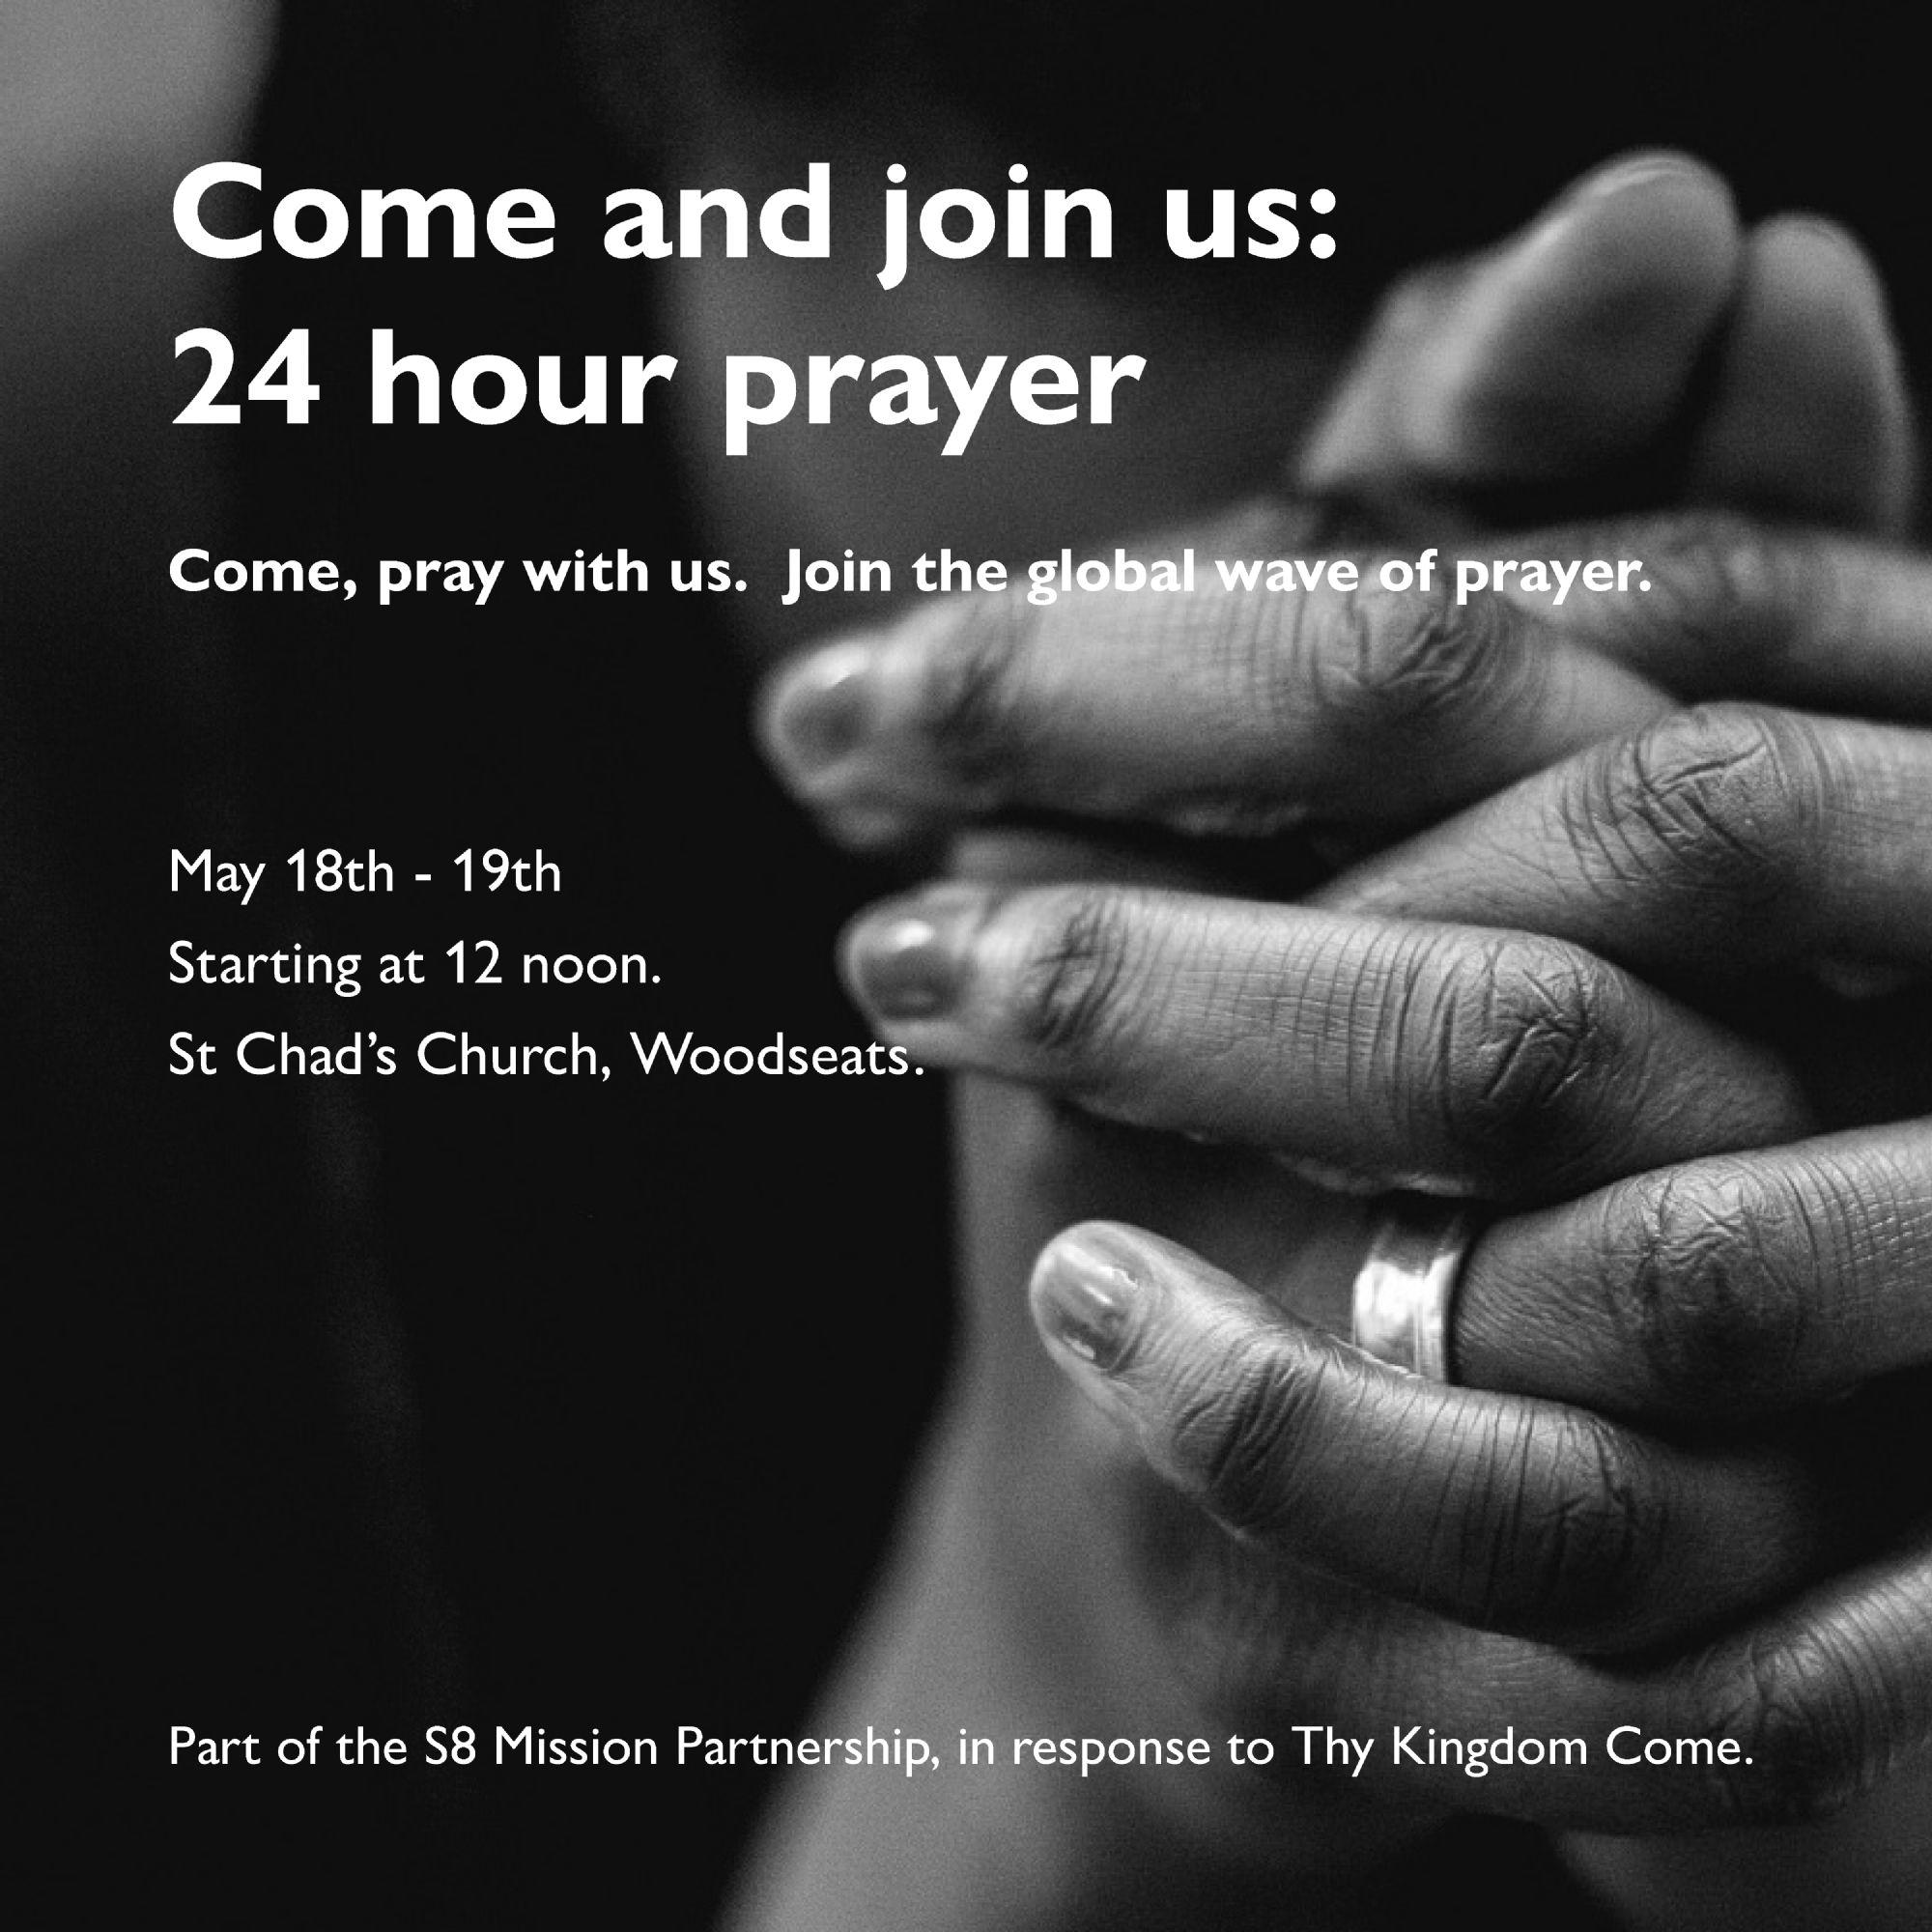 24-hour prayer